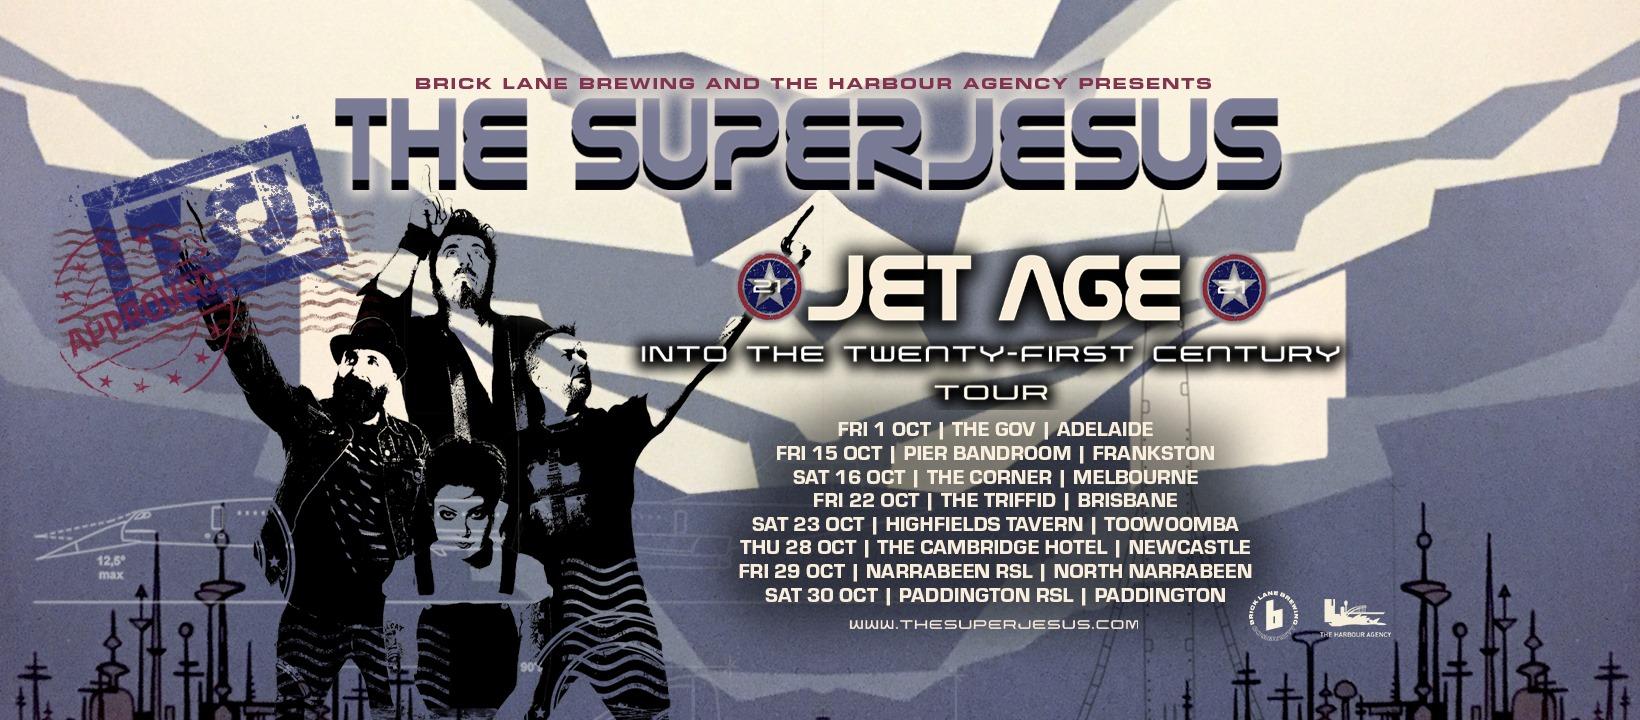 Jet Age into the 21st Century Tour – Newcastle